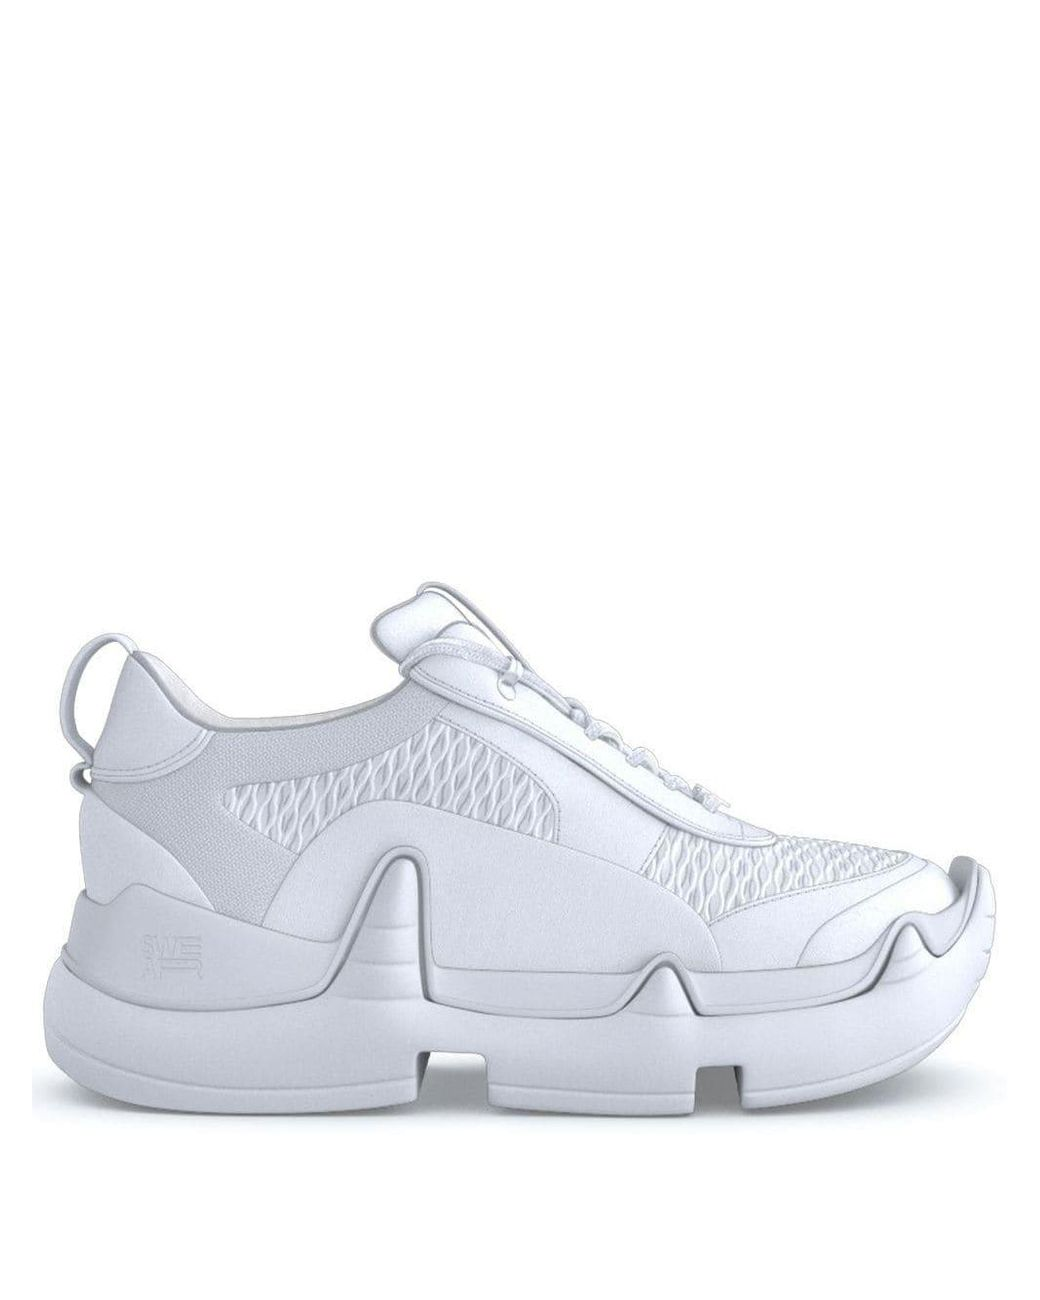 RevNitro Air Track Suede Sneakers Fast Swear rsCQxthd